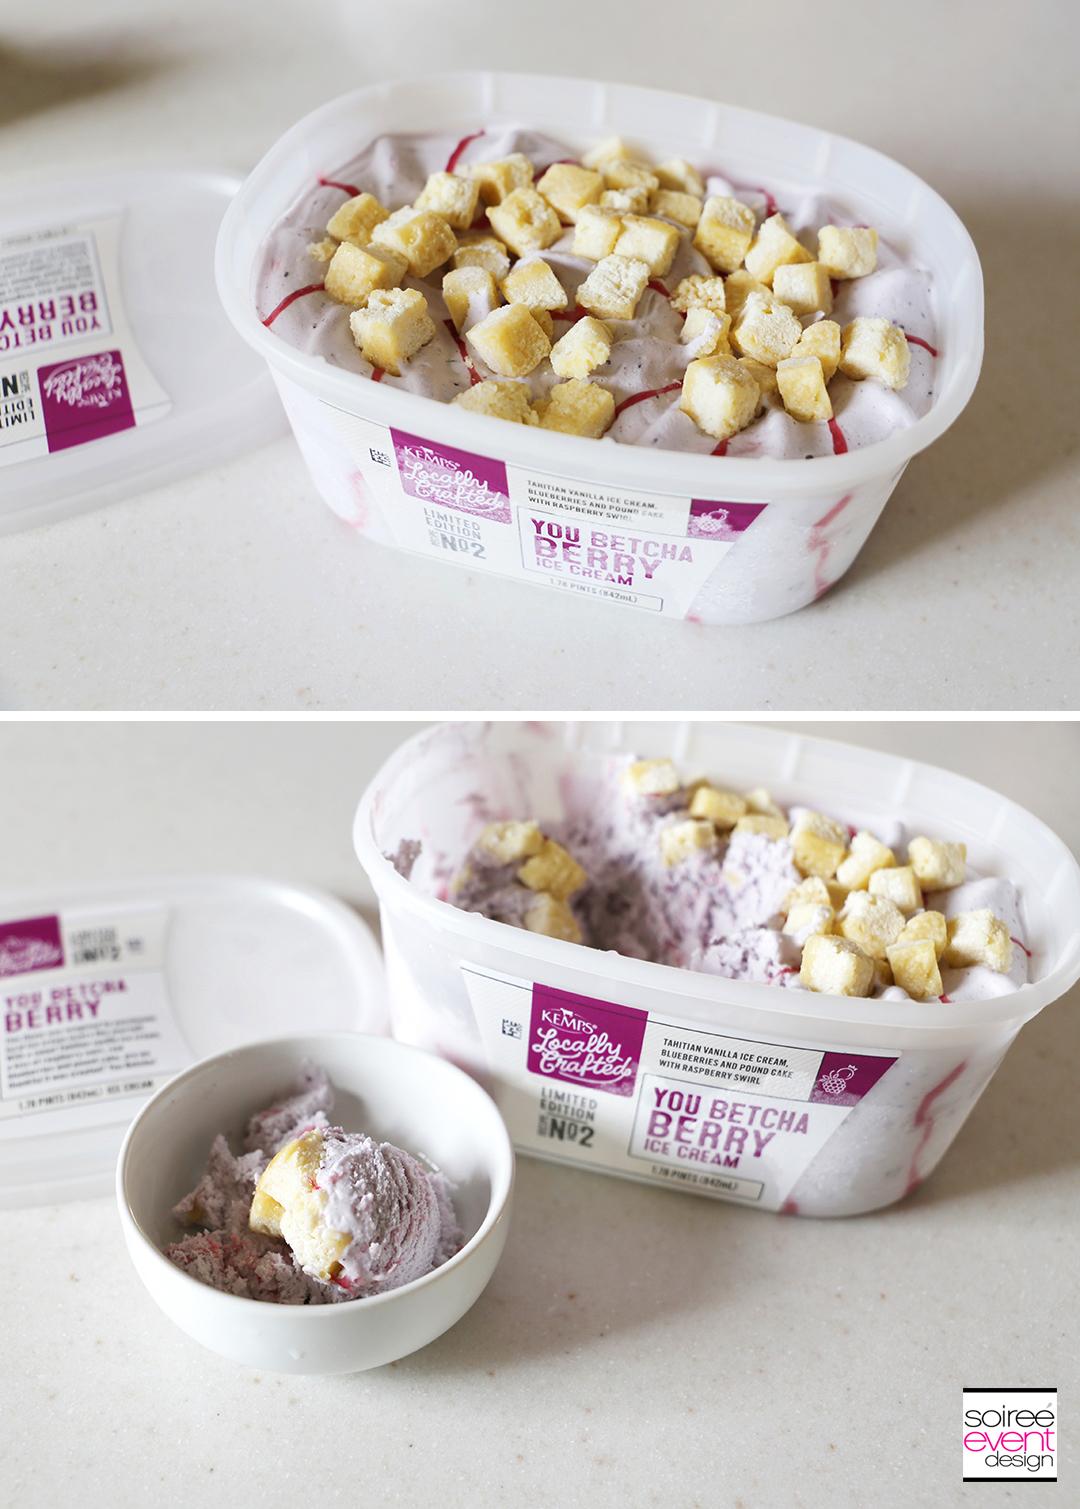 Kemps Ice Cream Tasting